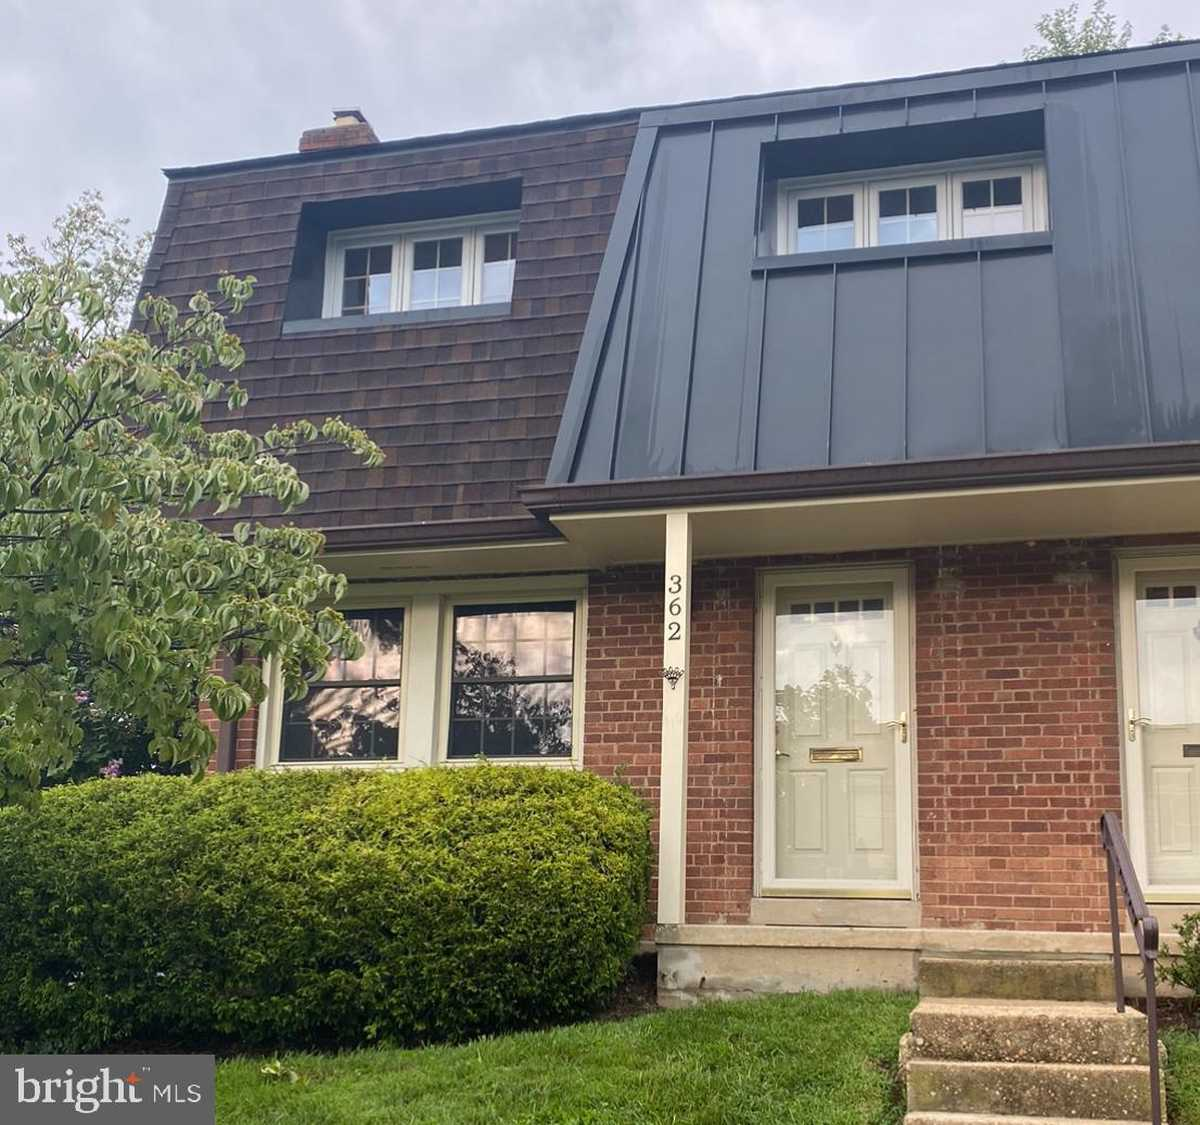 $474,500 - 2Br/1Ba -  for Sale in Winter Hill, Falls Church